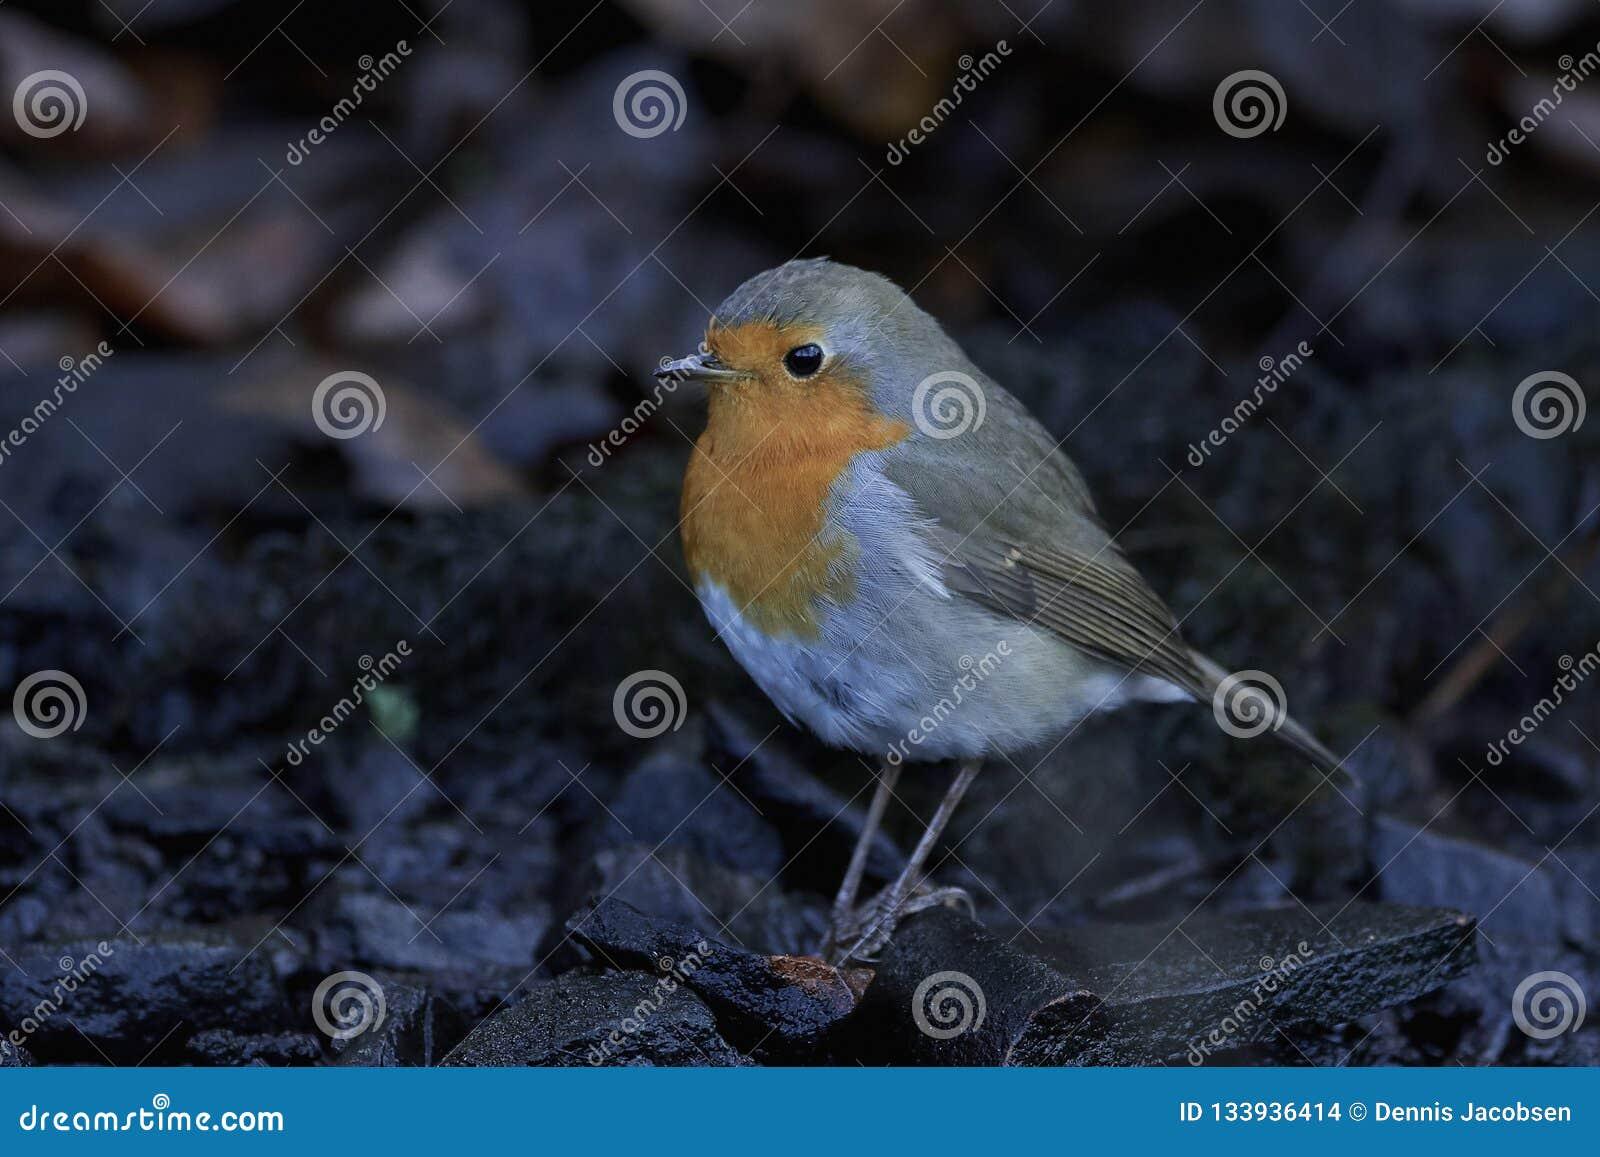 Europese Robin Erithacus-rubecula